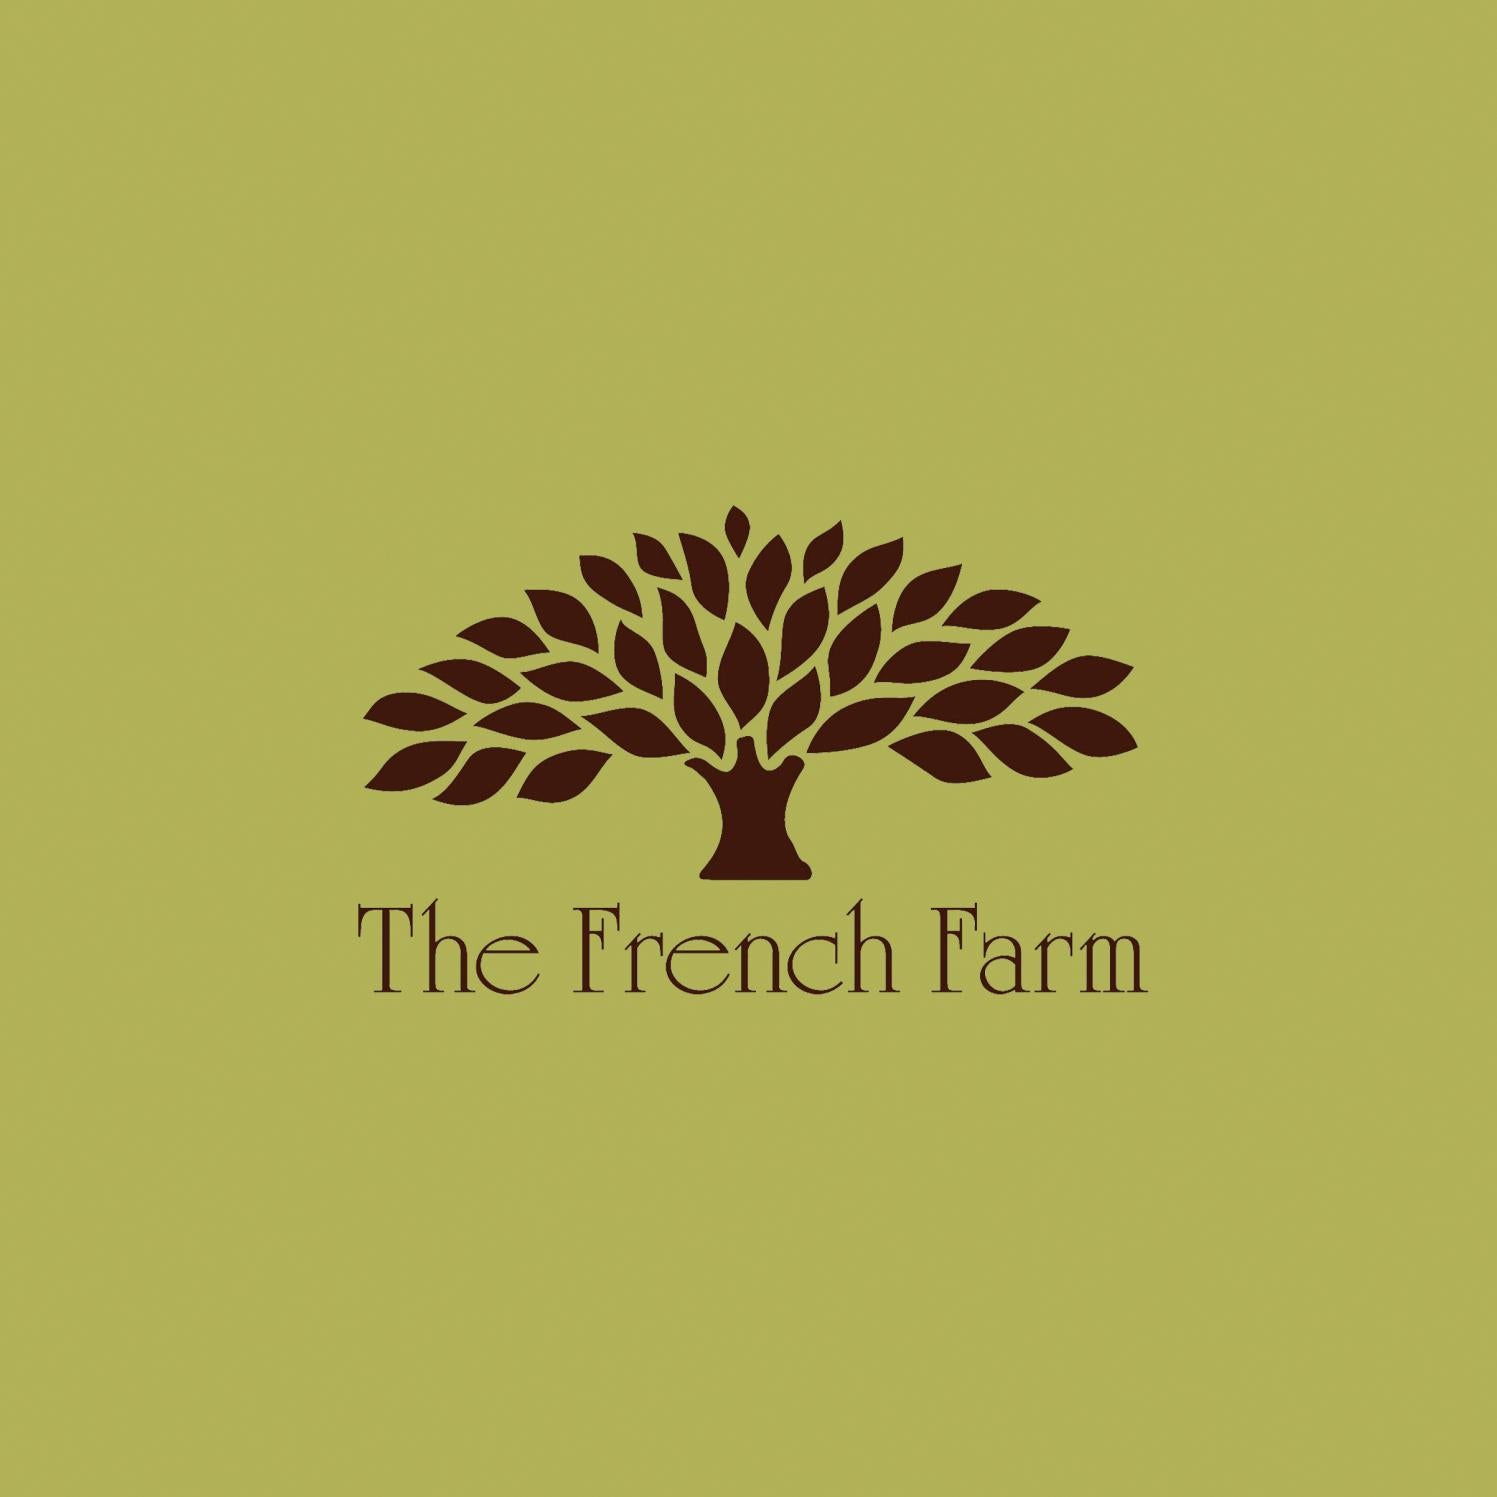 Fleur De Lotus Dijon the french farm catalog january 2020the french farm - issuu